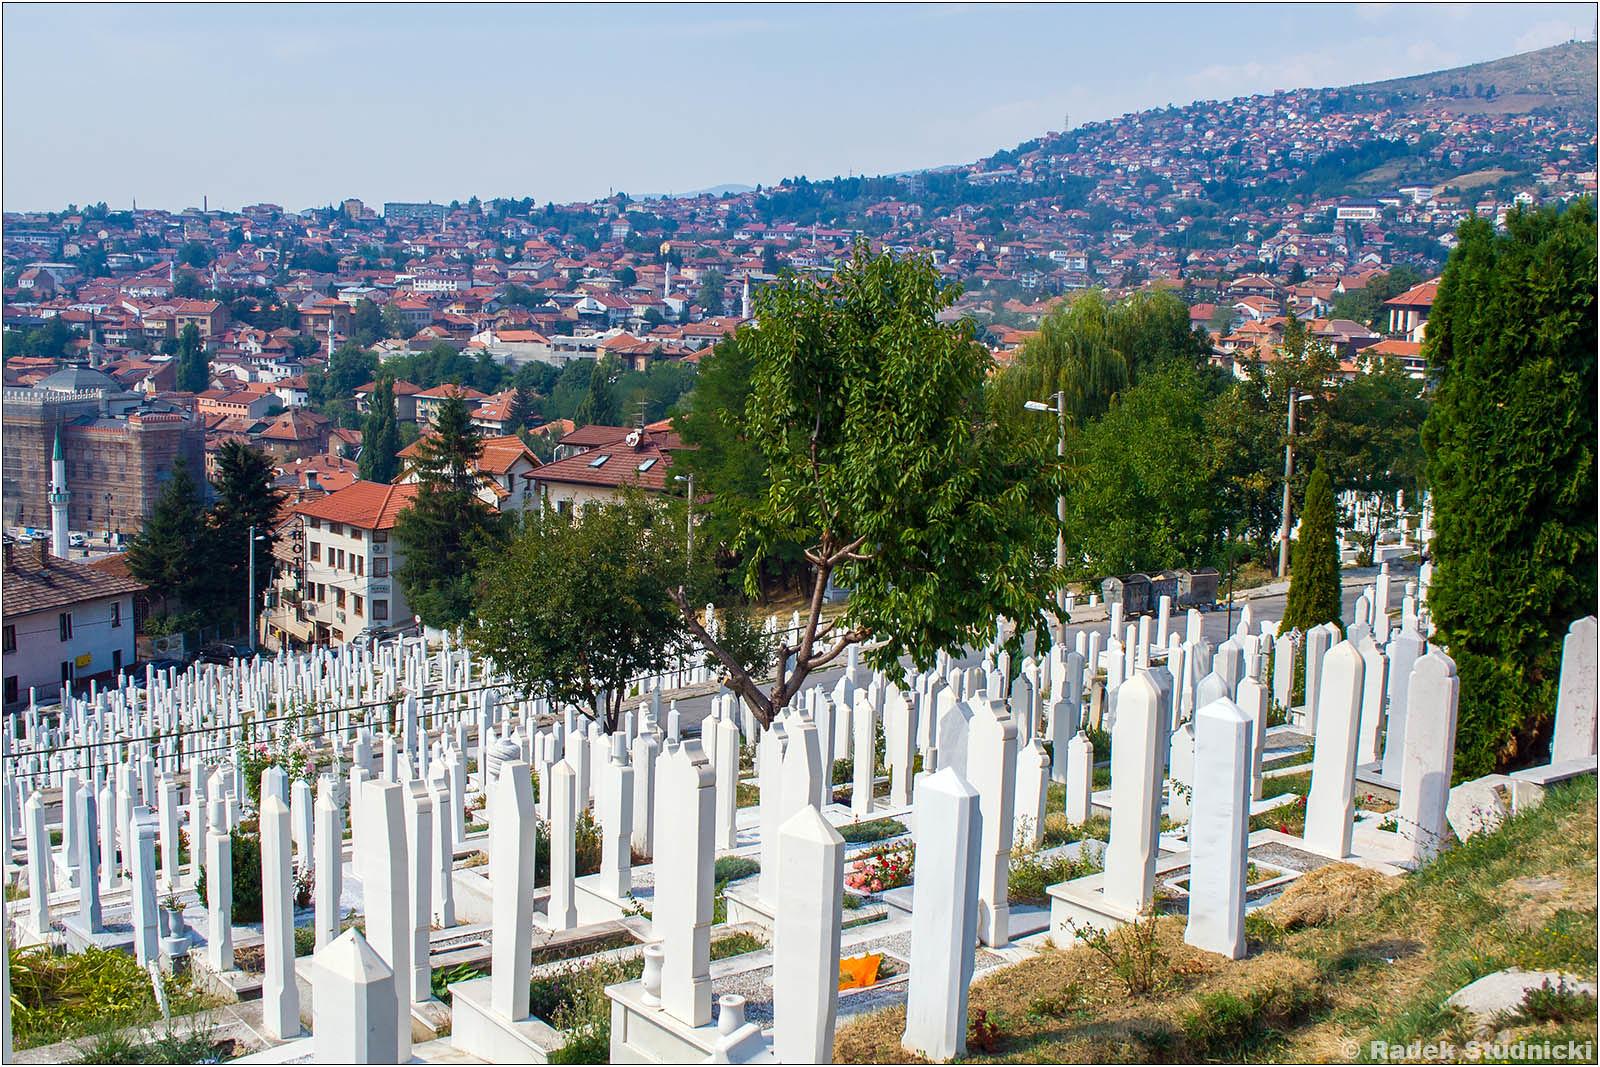 Widok z cmentarza na miasto